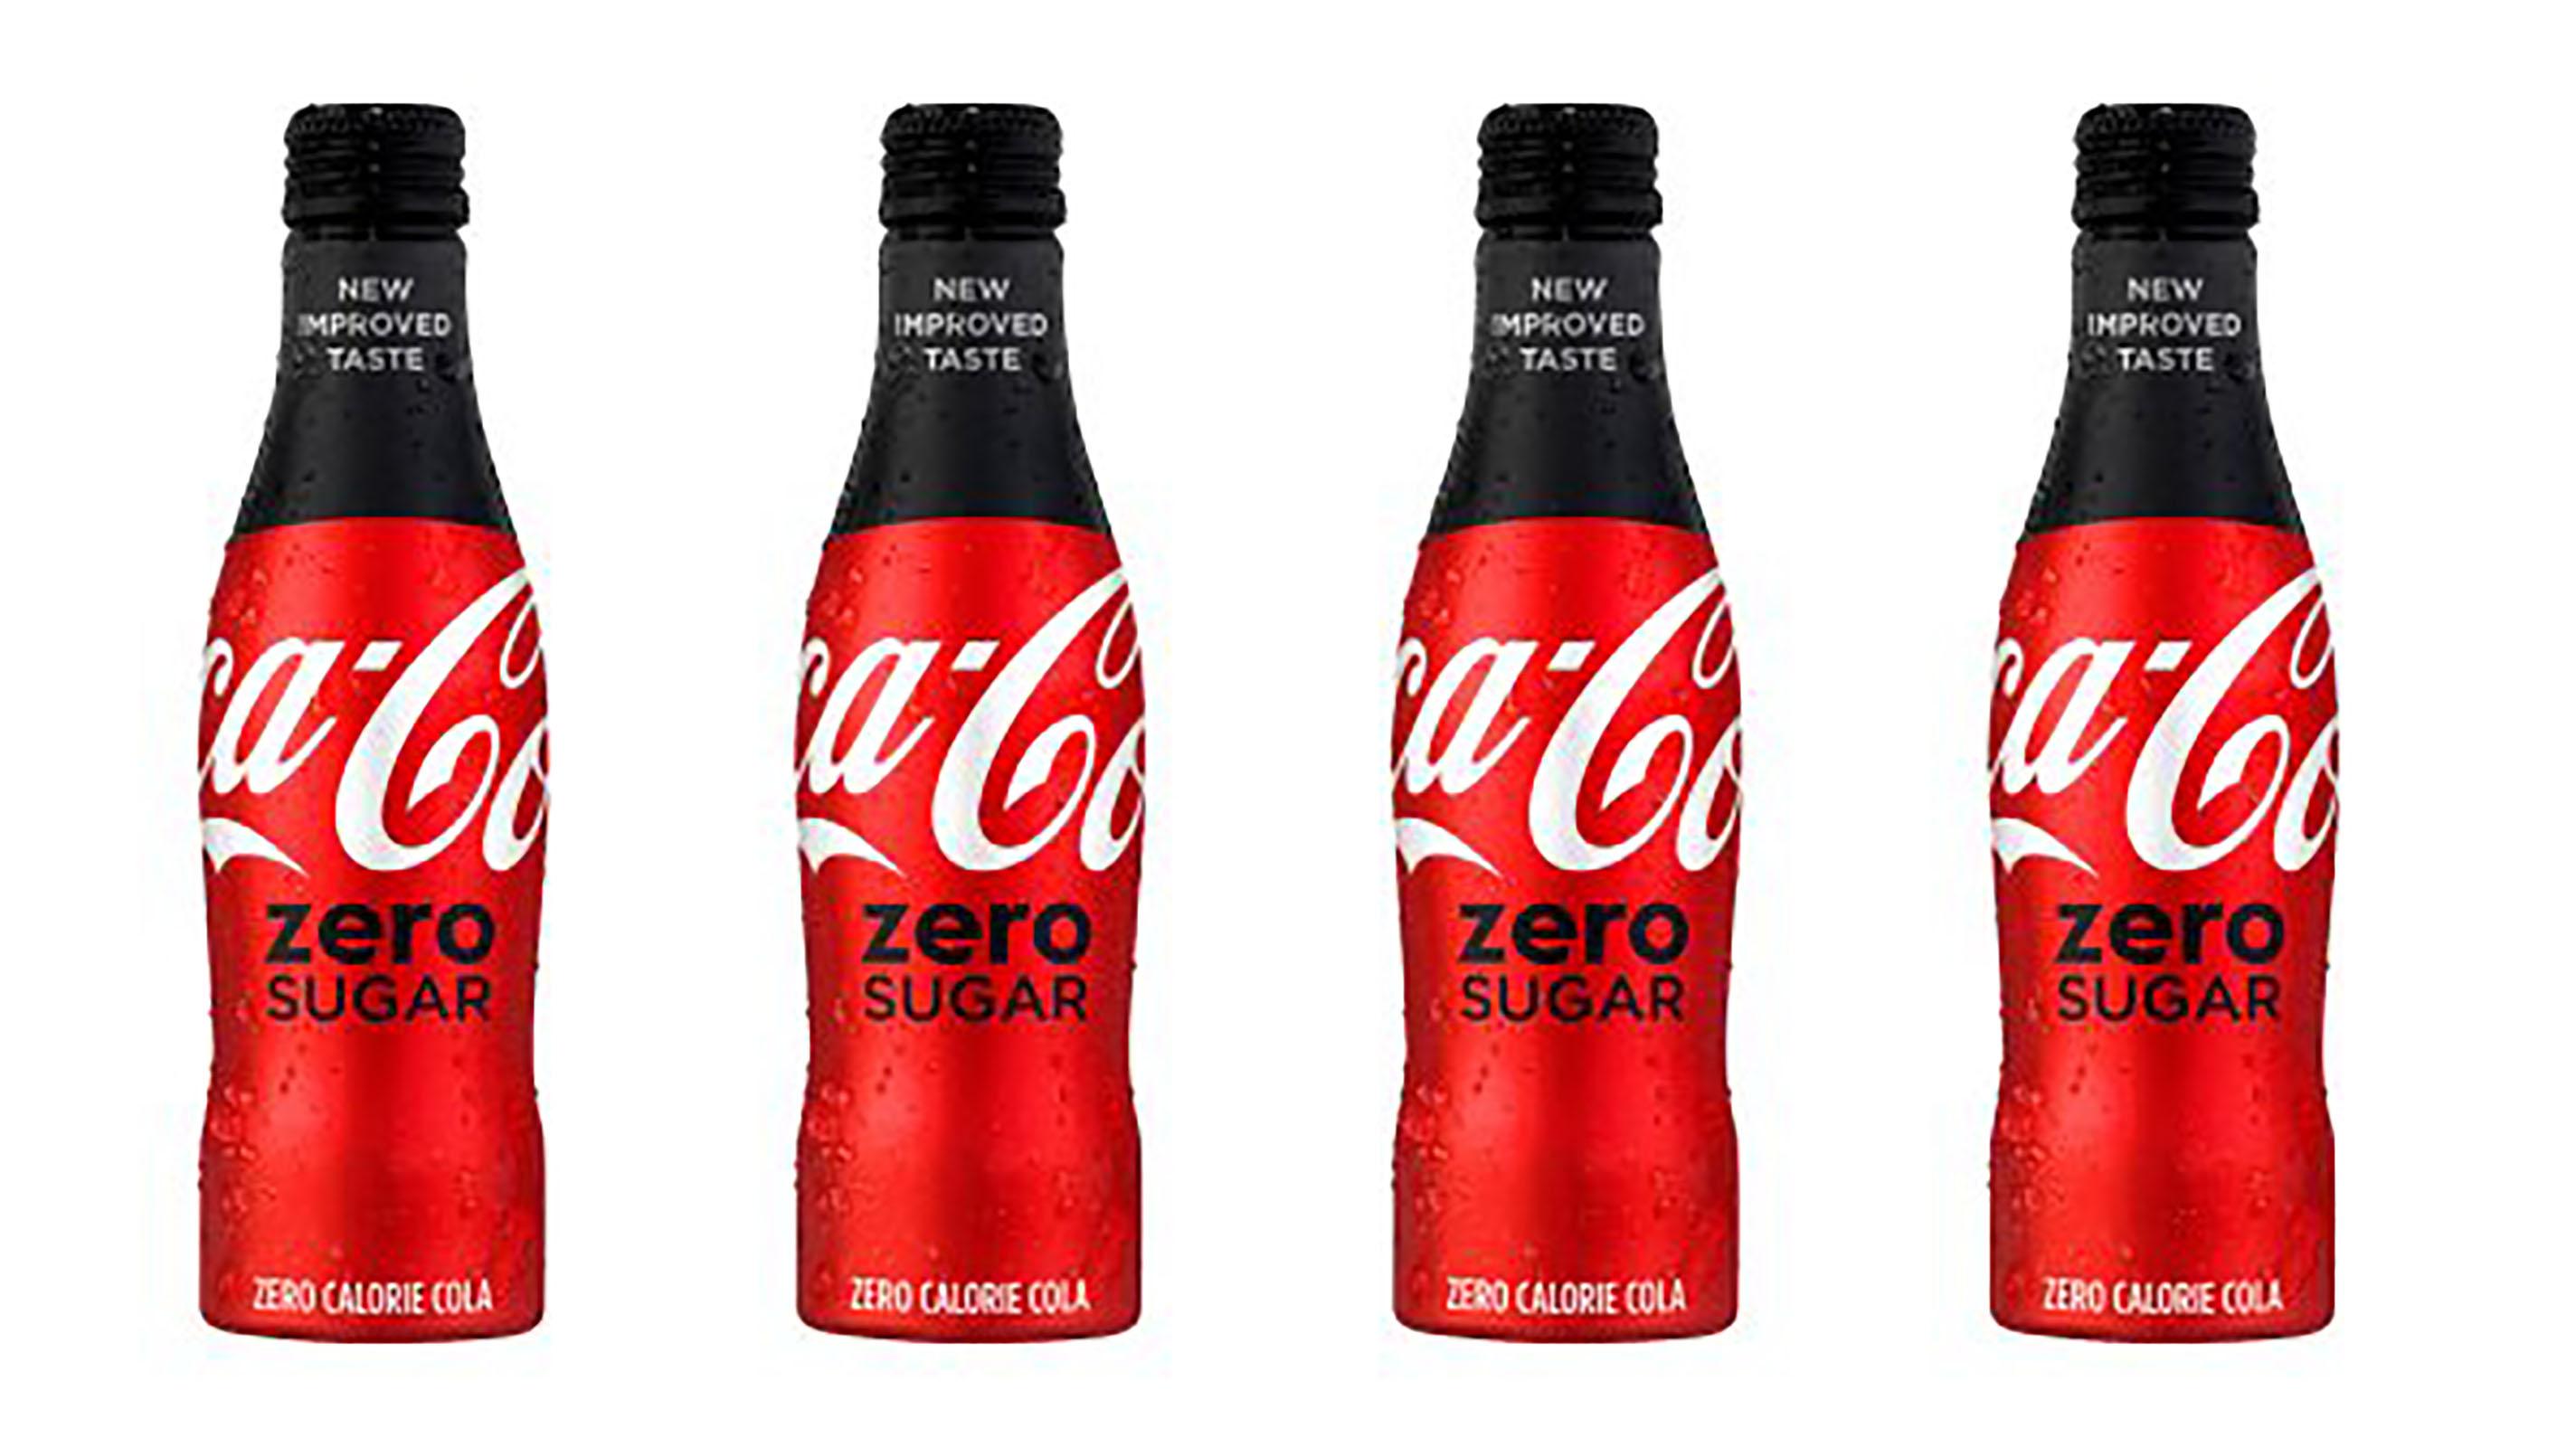 New Coke Zero